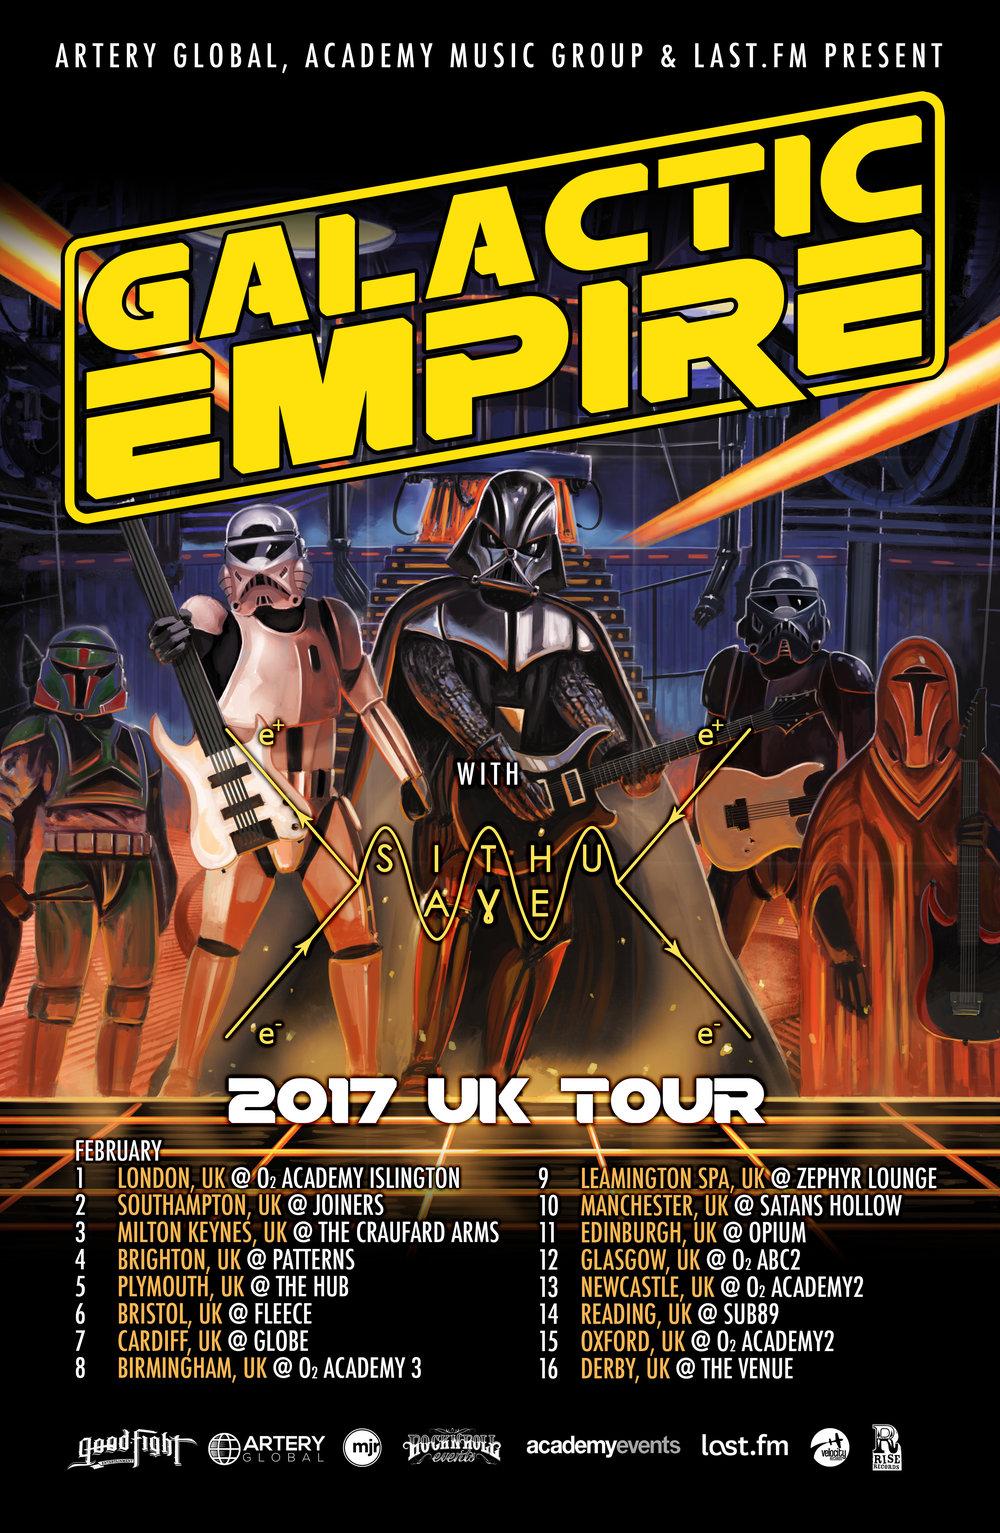 Galactic Empire UK Tour Poster.jpg